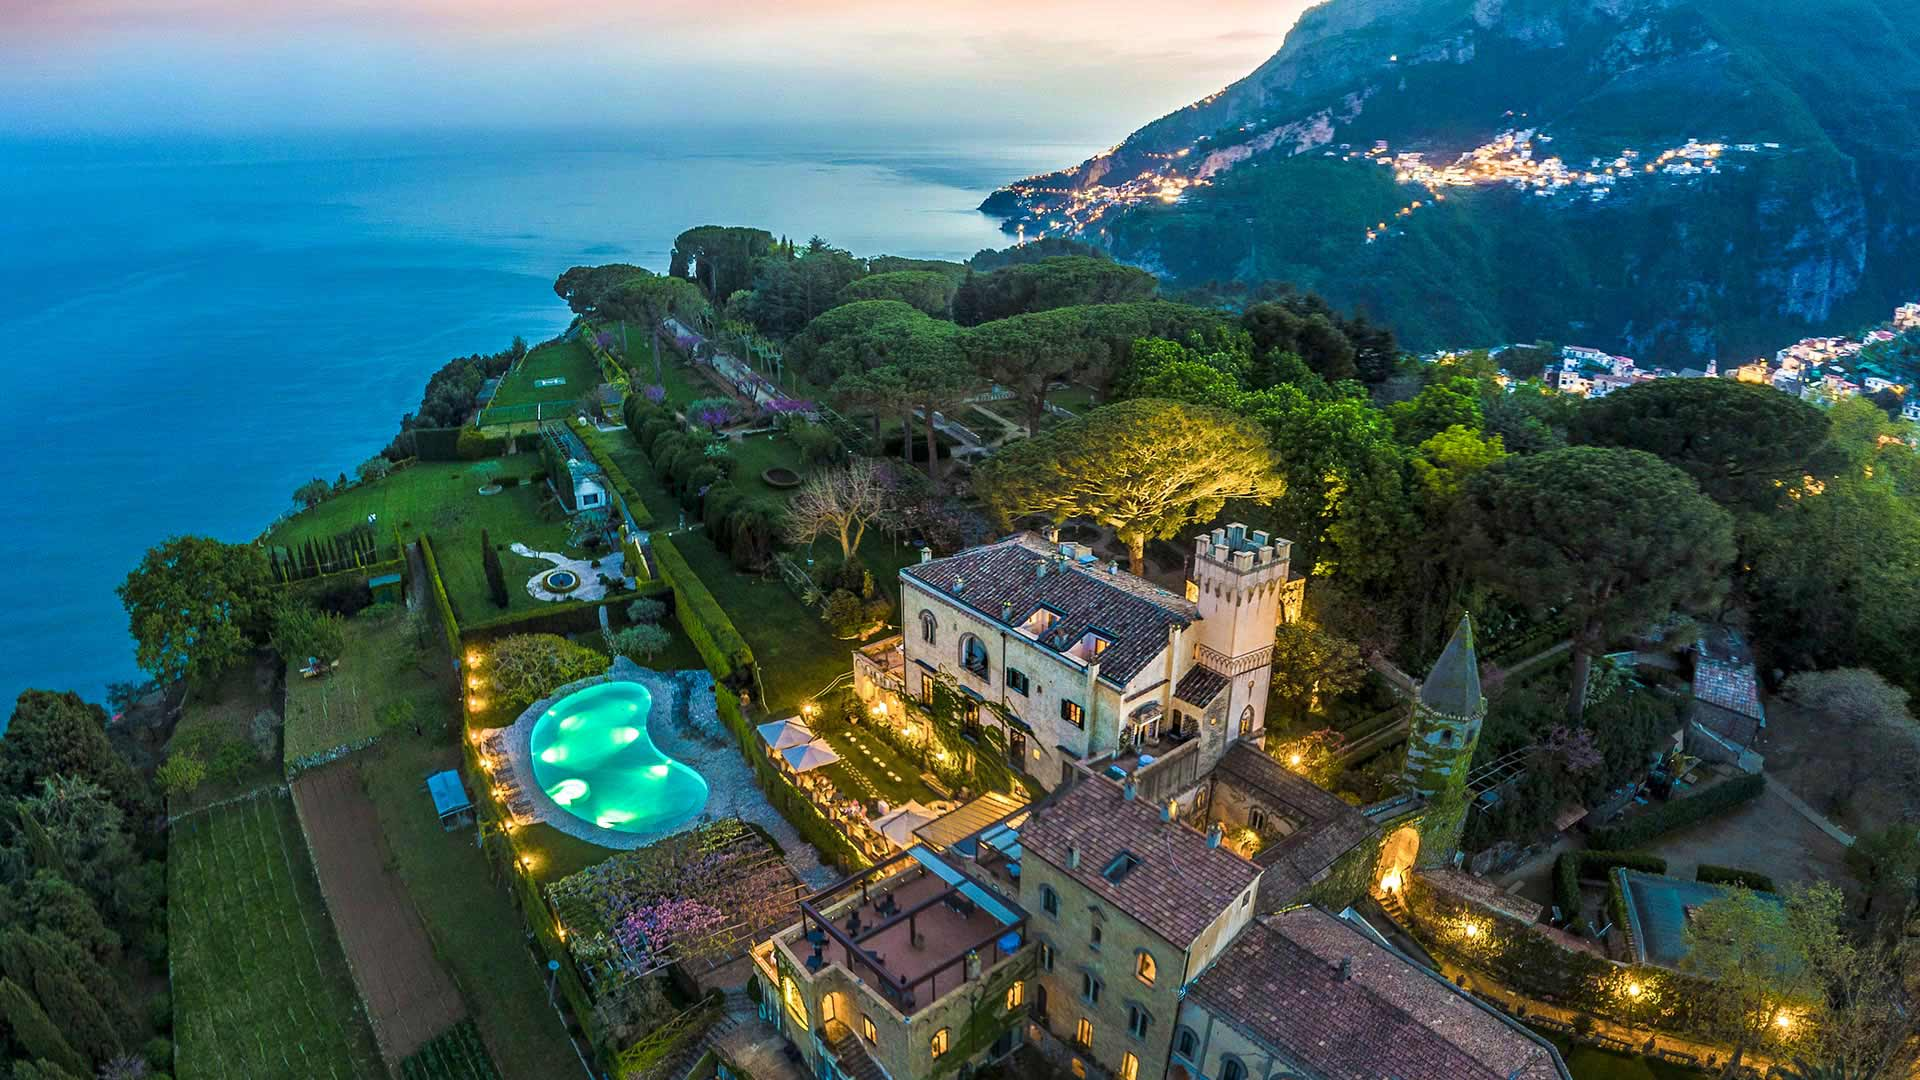 Hotel Villa Cimbrone   Ravello   Amalfi Coast   Italy